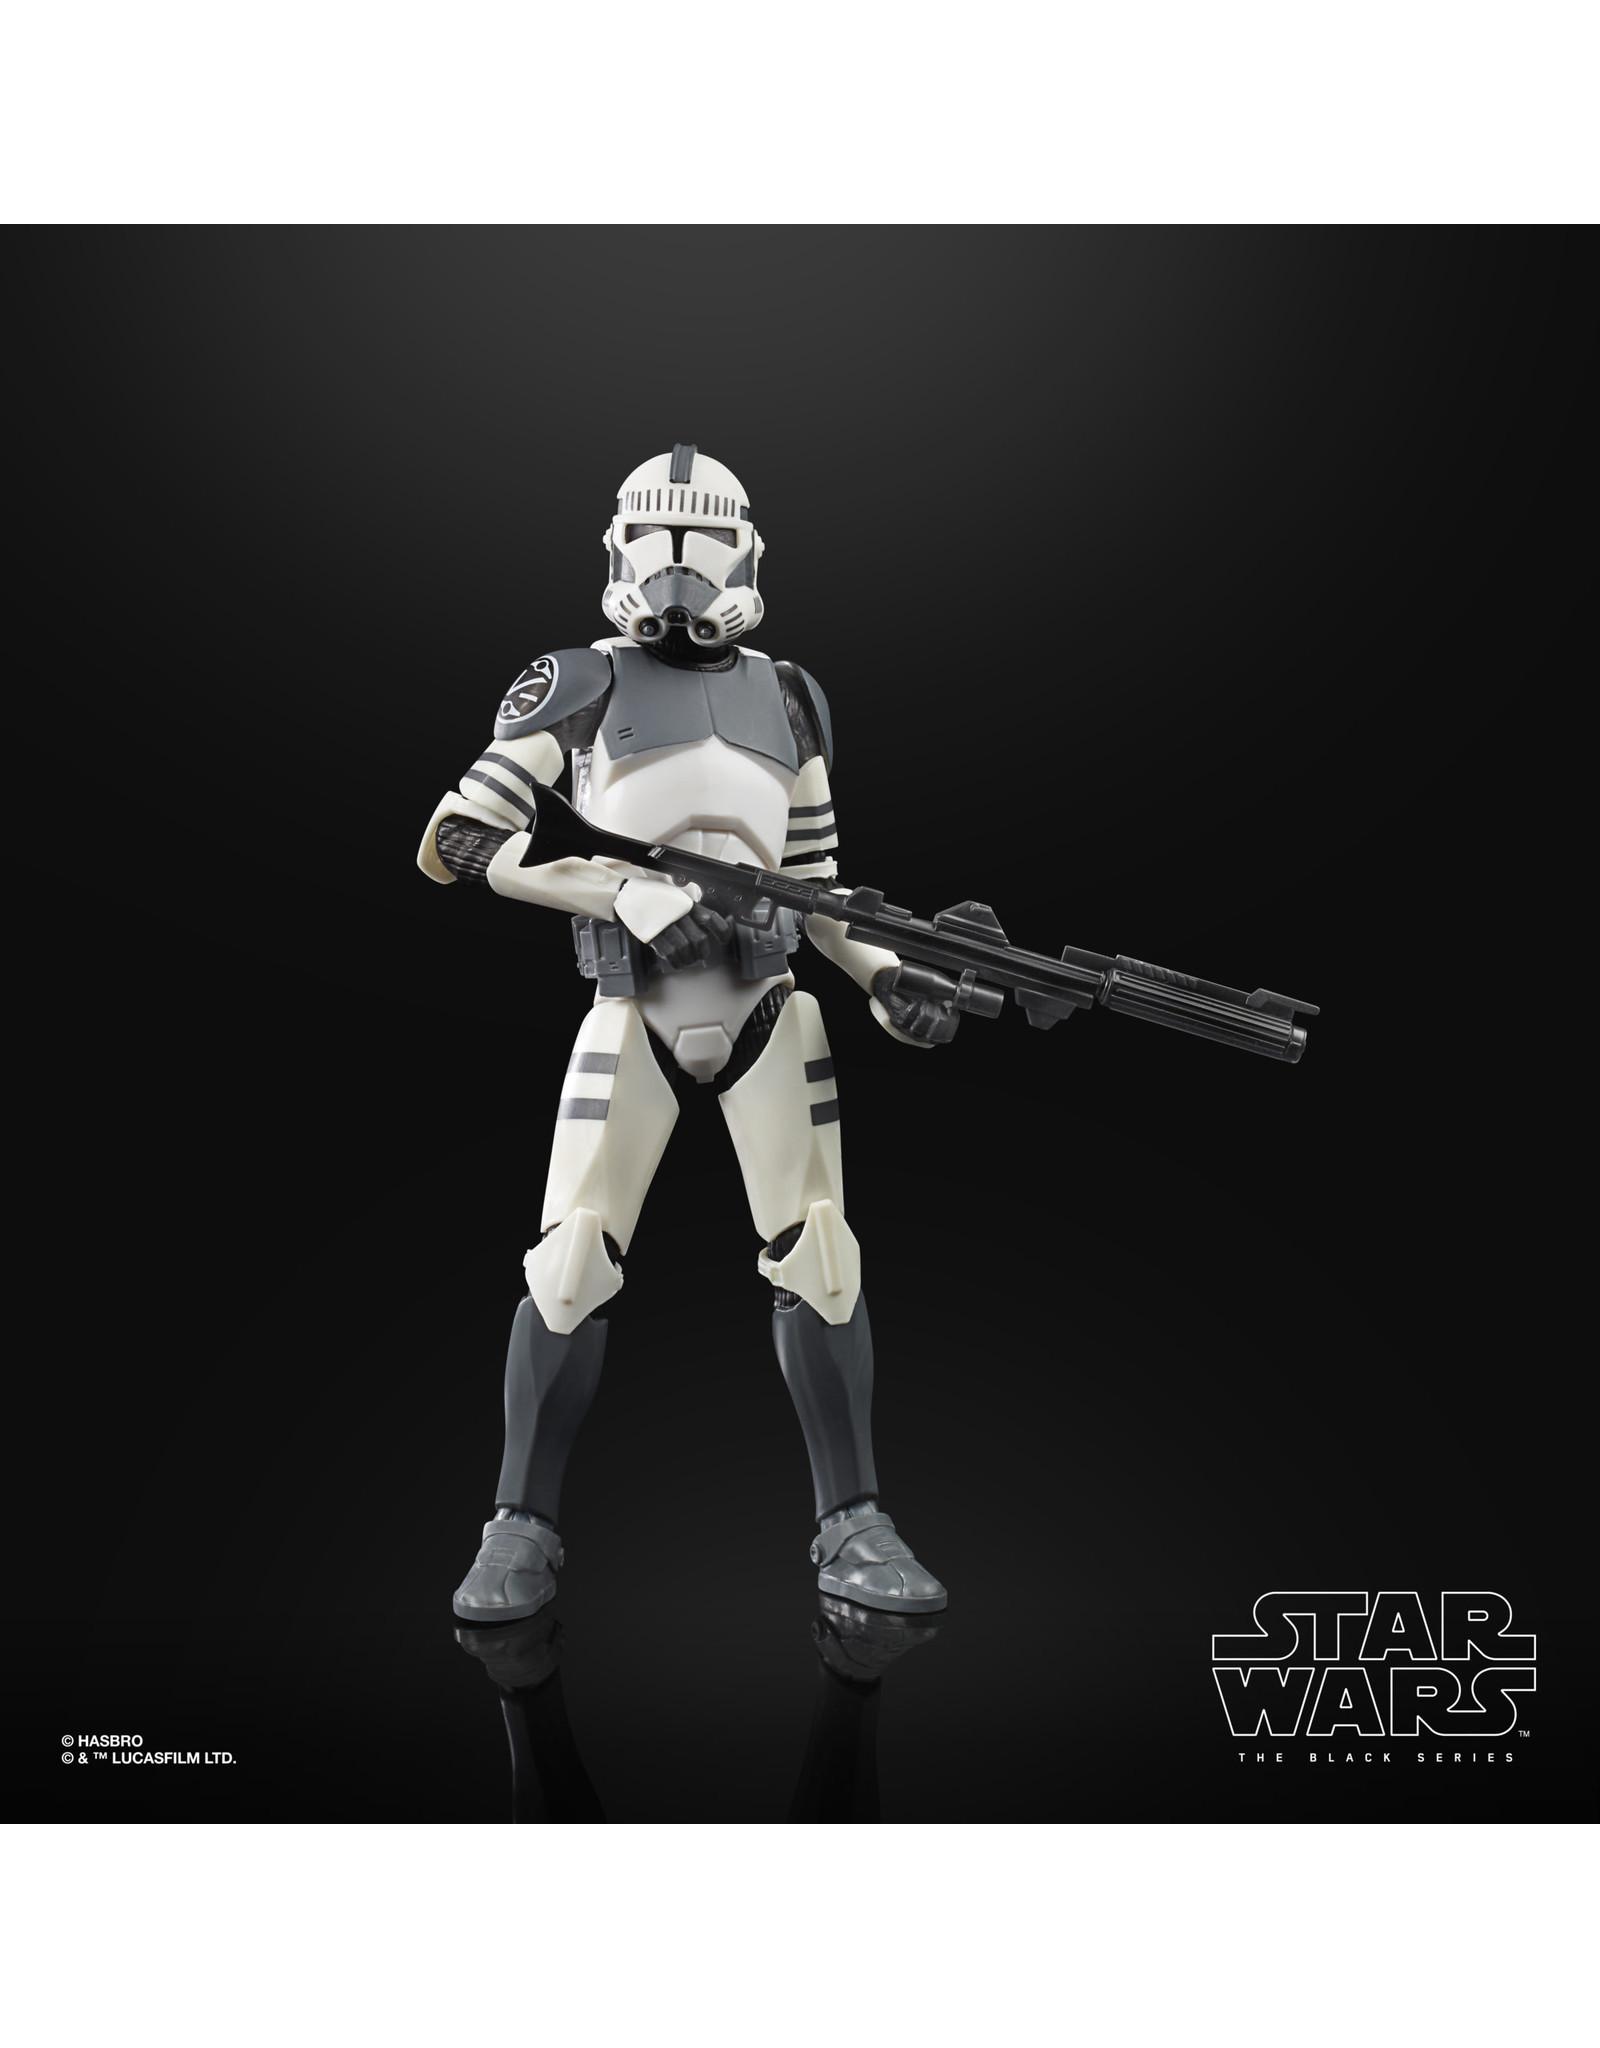 Hasbro Star Wars The Black Series Clone Trooper (Kamino) Collectible Figure